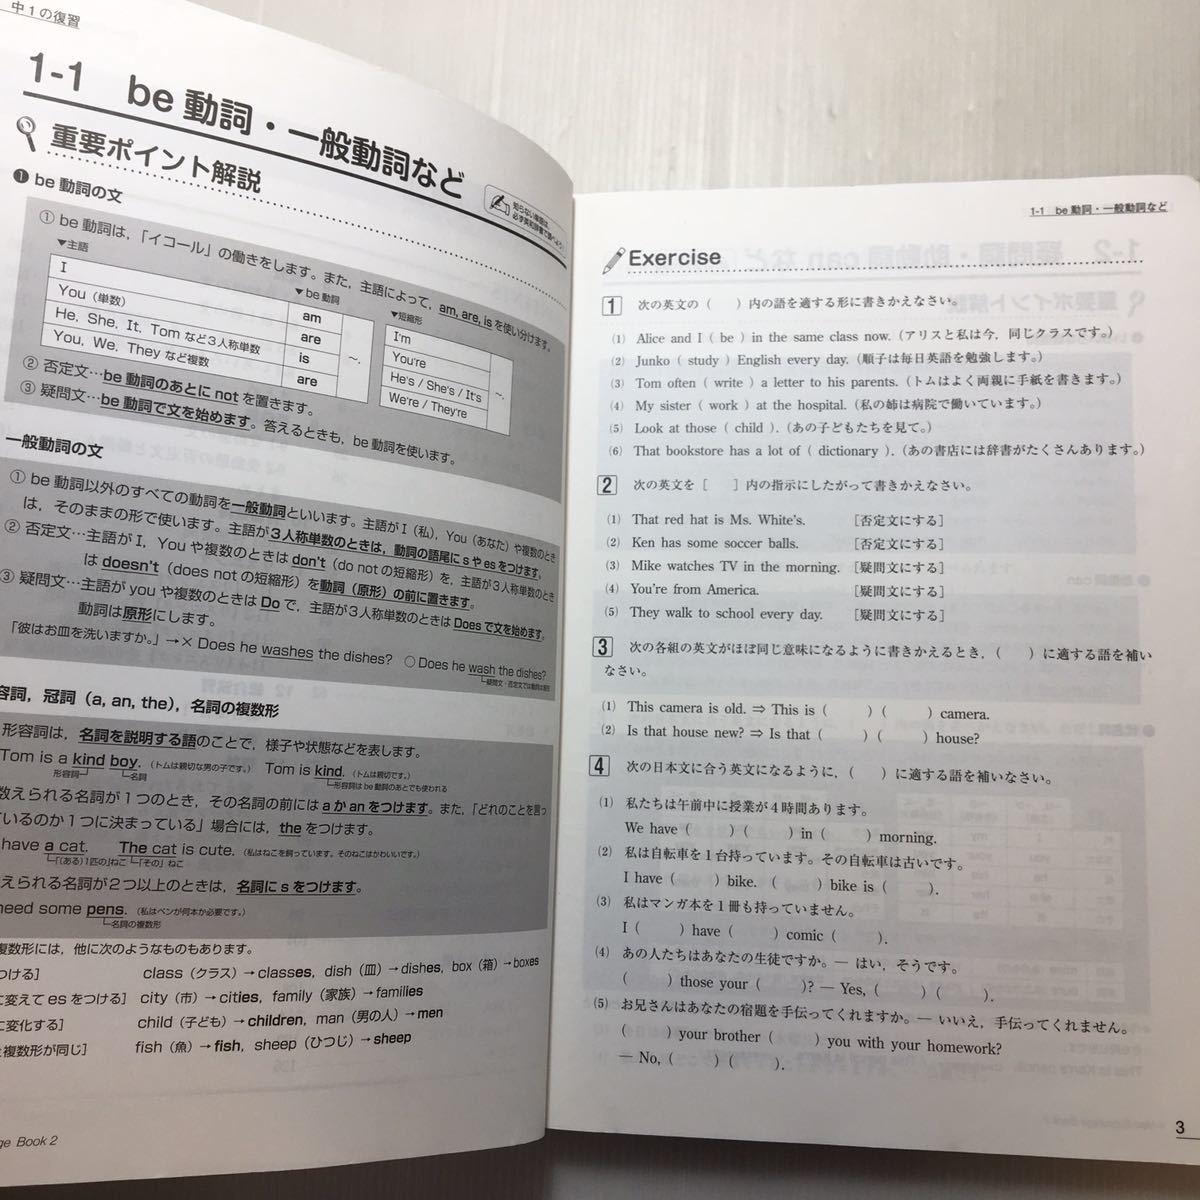 zaa-183♪塾専用  創造学園『Encourage』 中2英語 問題集『リスニングCDなし』別冊解答付